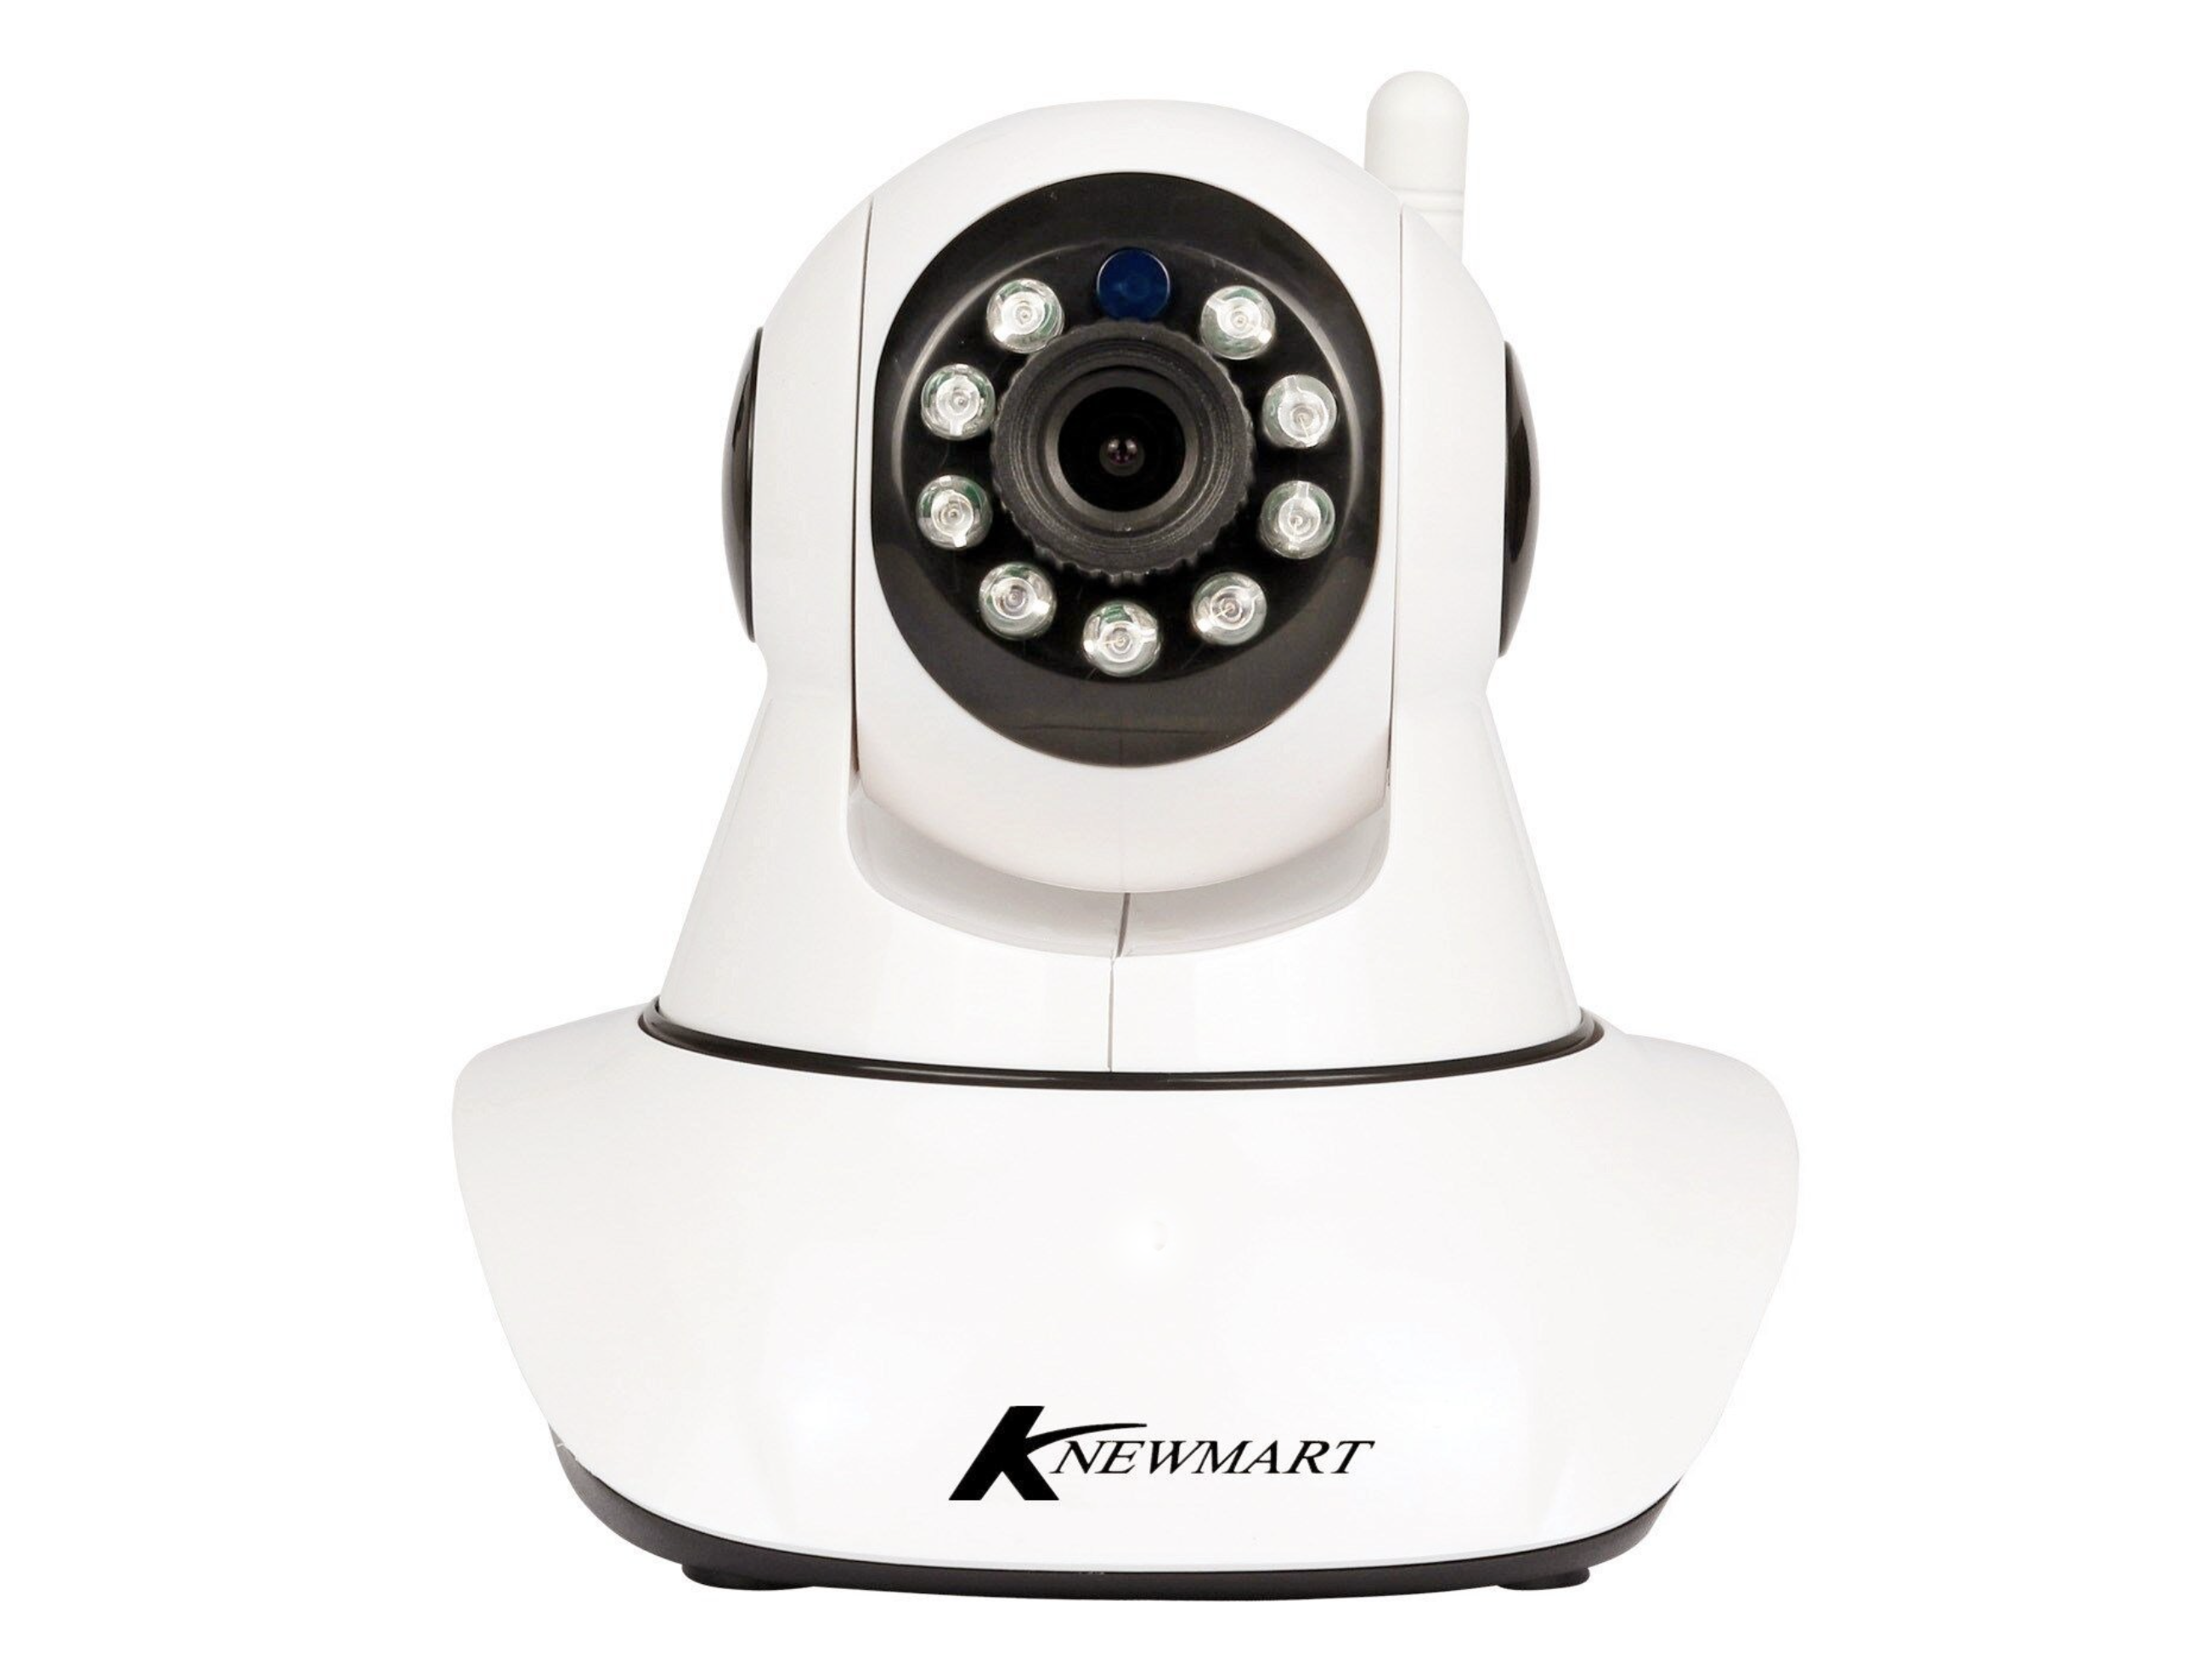 La caméra de surveillance IP Knewmart